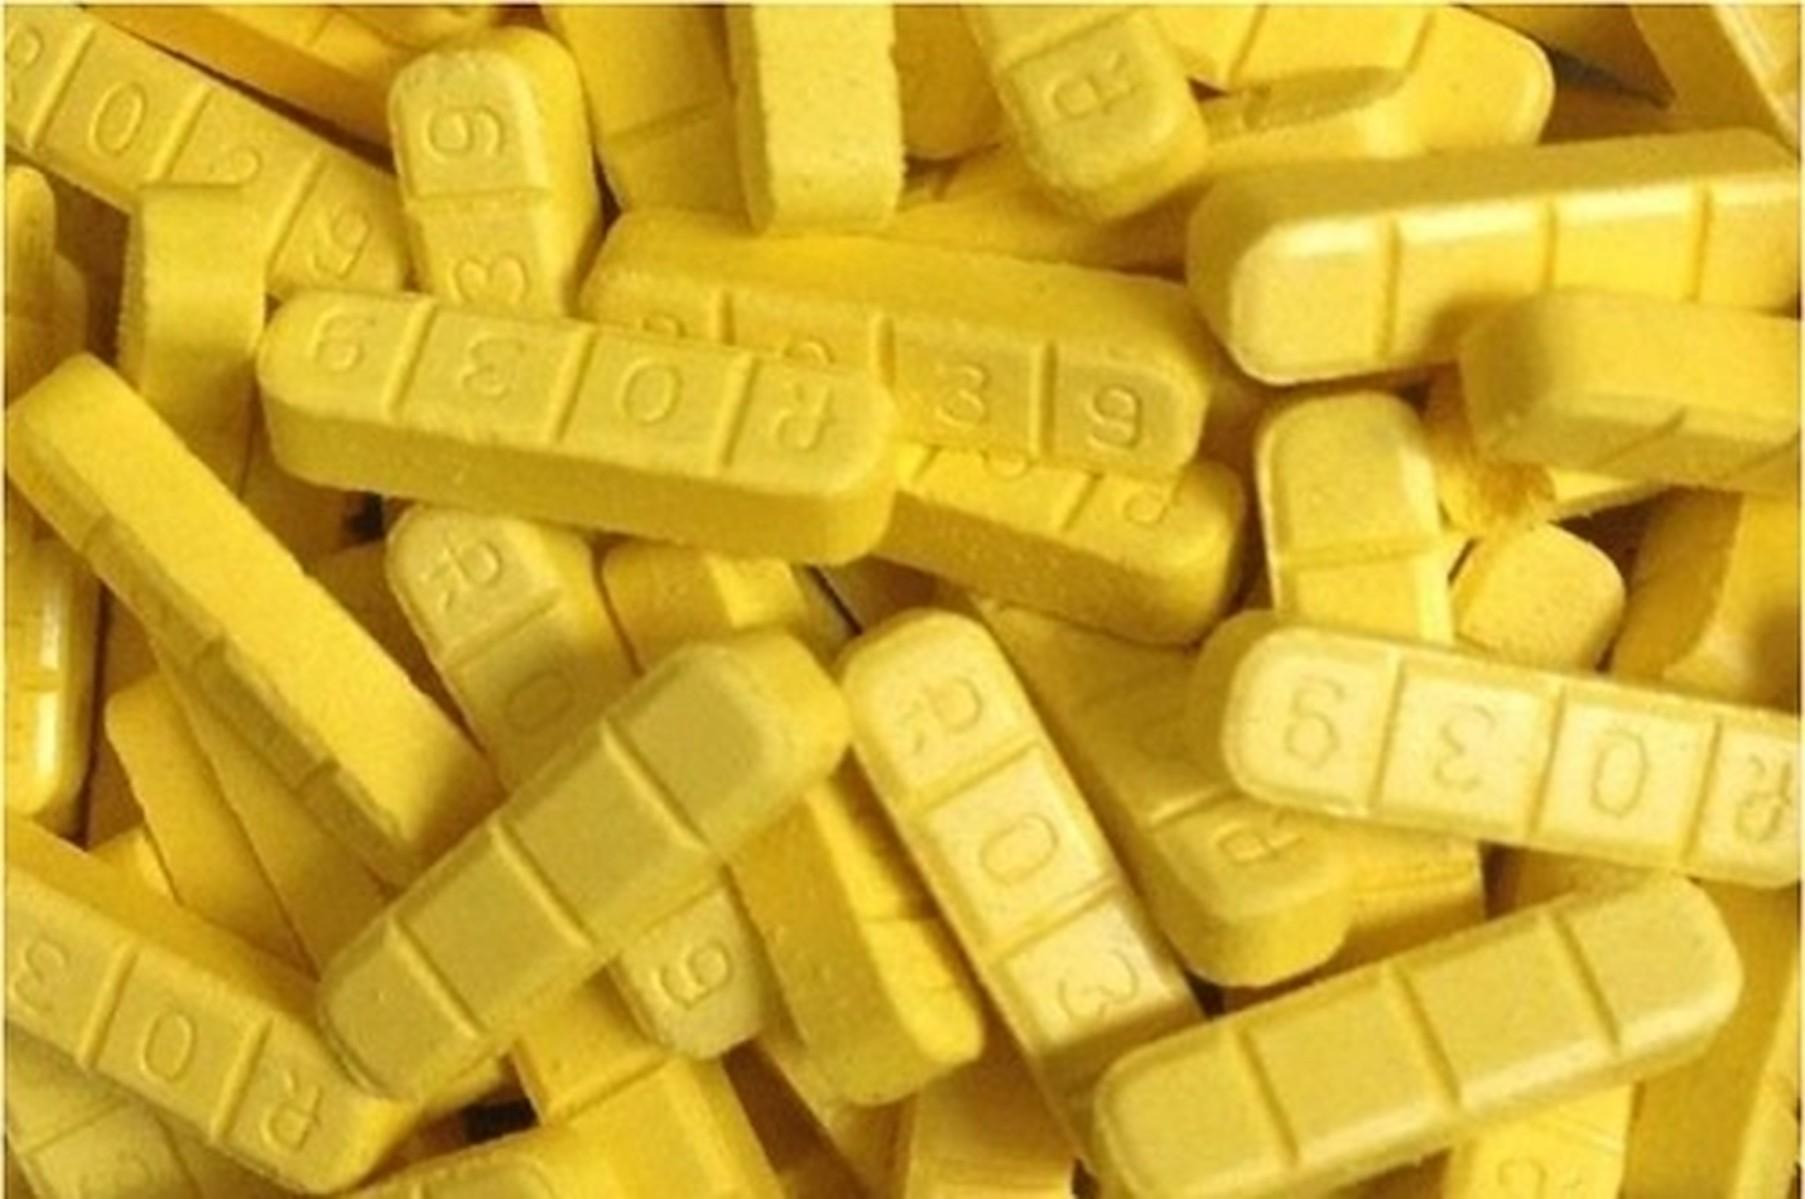 Buy Real Yellow Xanax bars r039